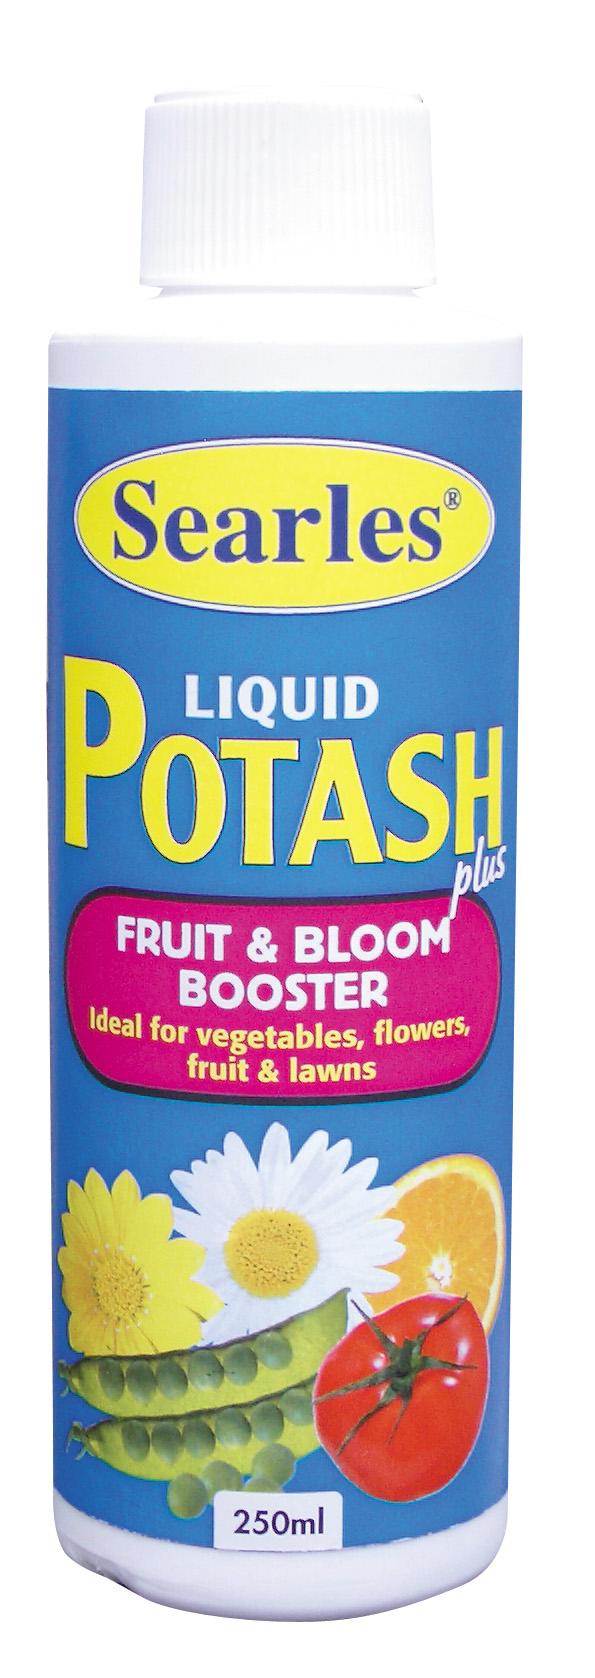 Searles Liquid Potash Plus 250mL